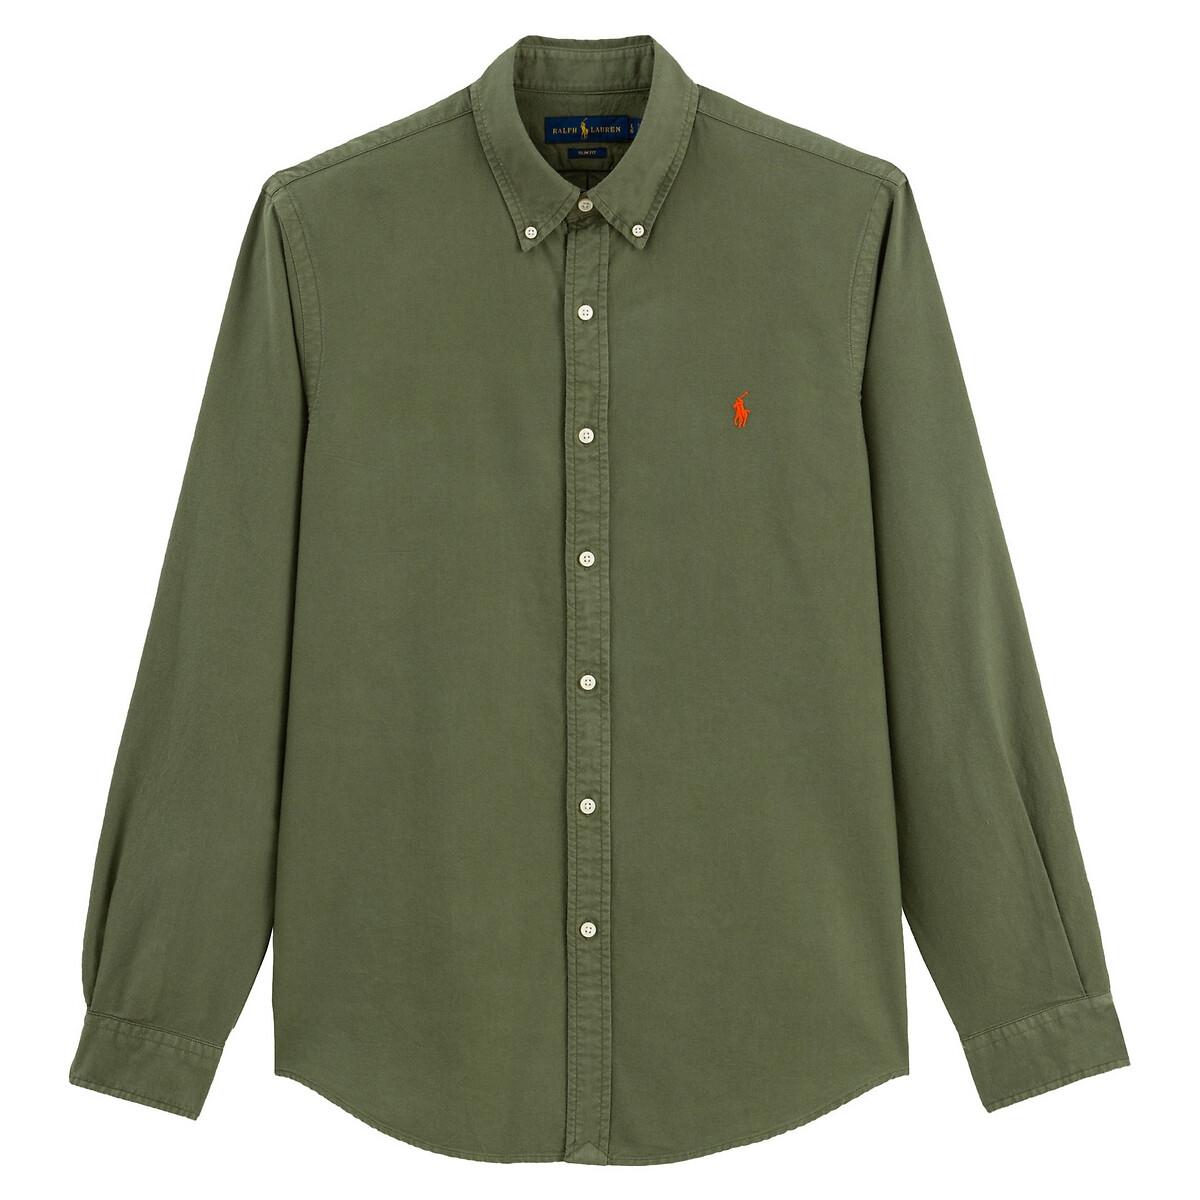 Рубашка La Redoute Узкого покроя из ткани оксфорд XL зеленый рубашка la redoute из ткани оксфорд 16 лет 162 см синий